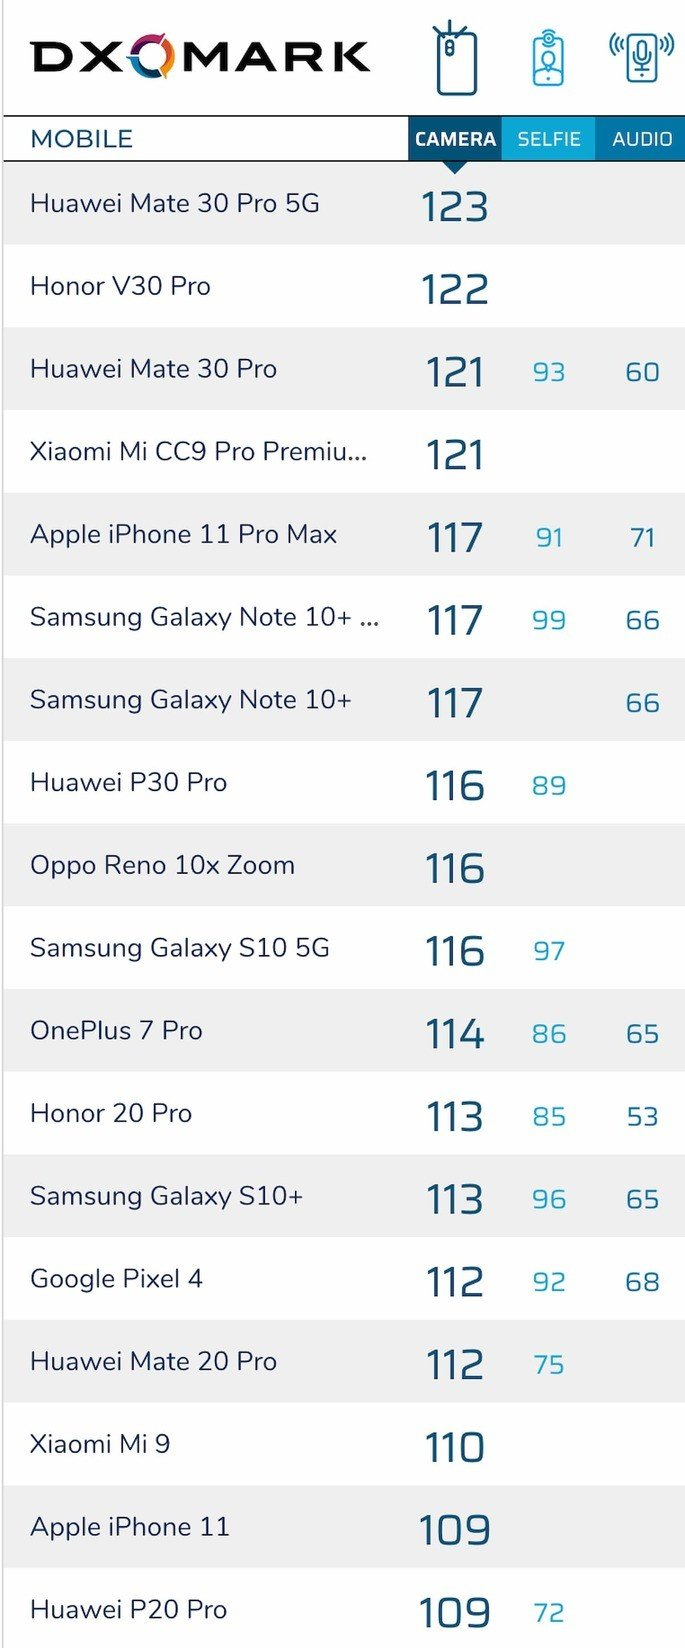 smartphones DxOmark iPhone 11, Xiaomi mi 9 e OnePlus 7